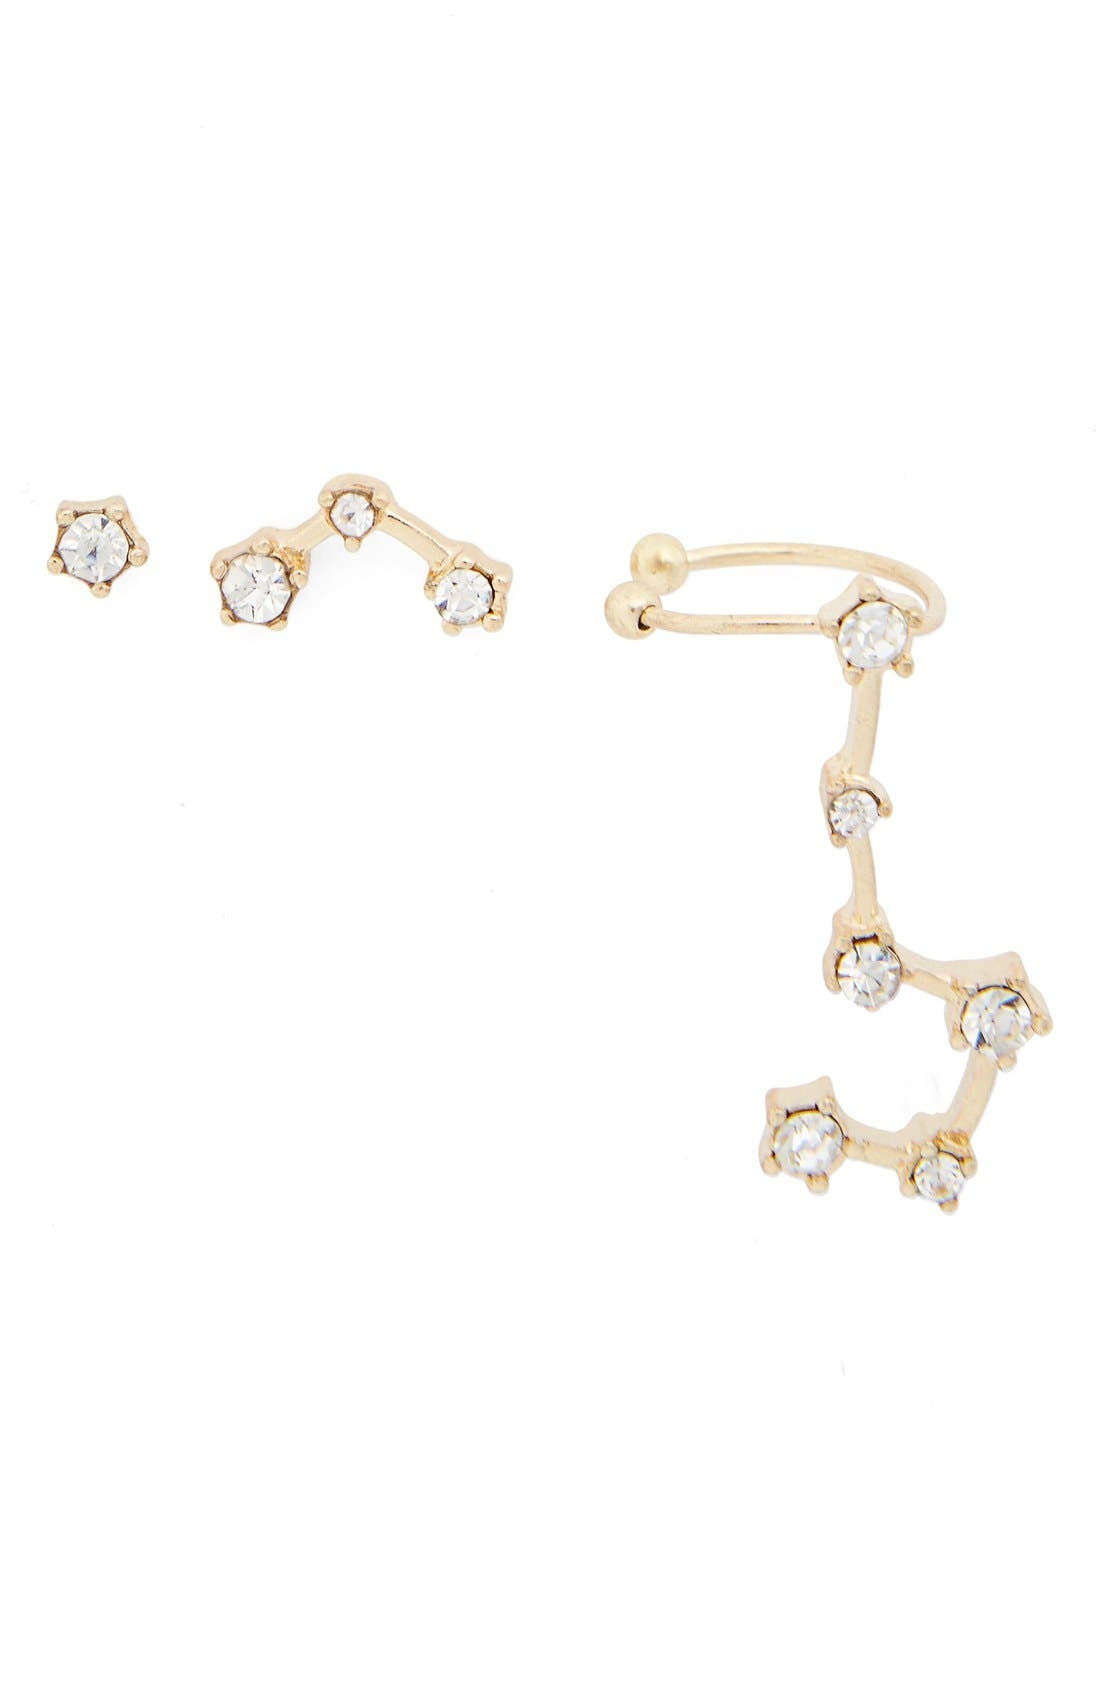 Main Image - BP. Crystal Constellation Earrings & Cuff (Set of 3)